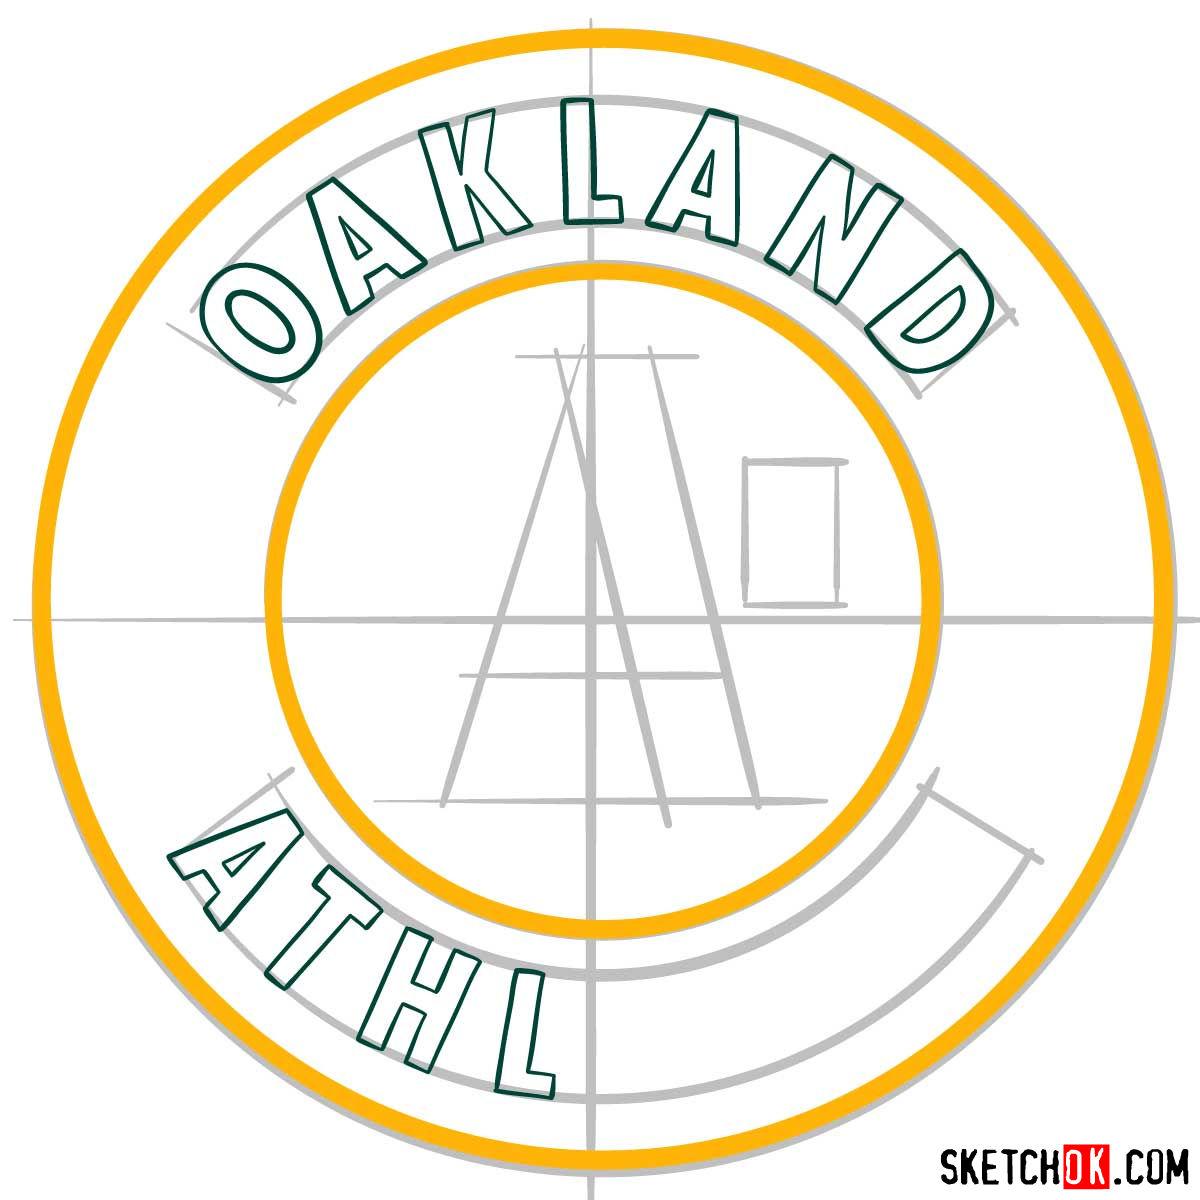 How to draw Oakland Athletics logo | MLB logos - step 06